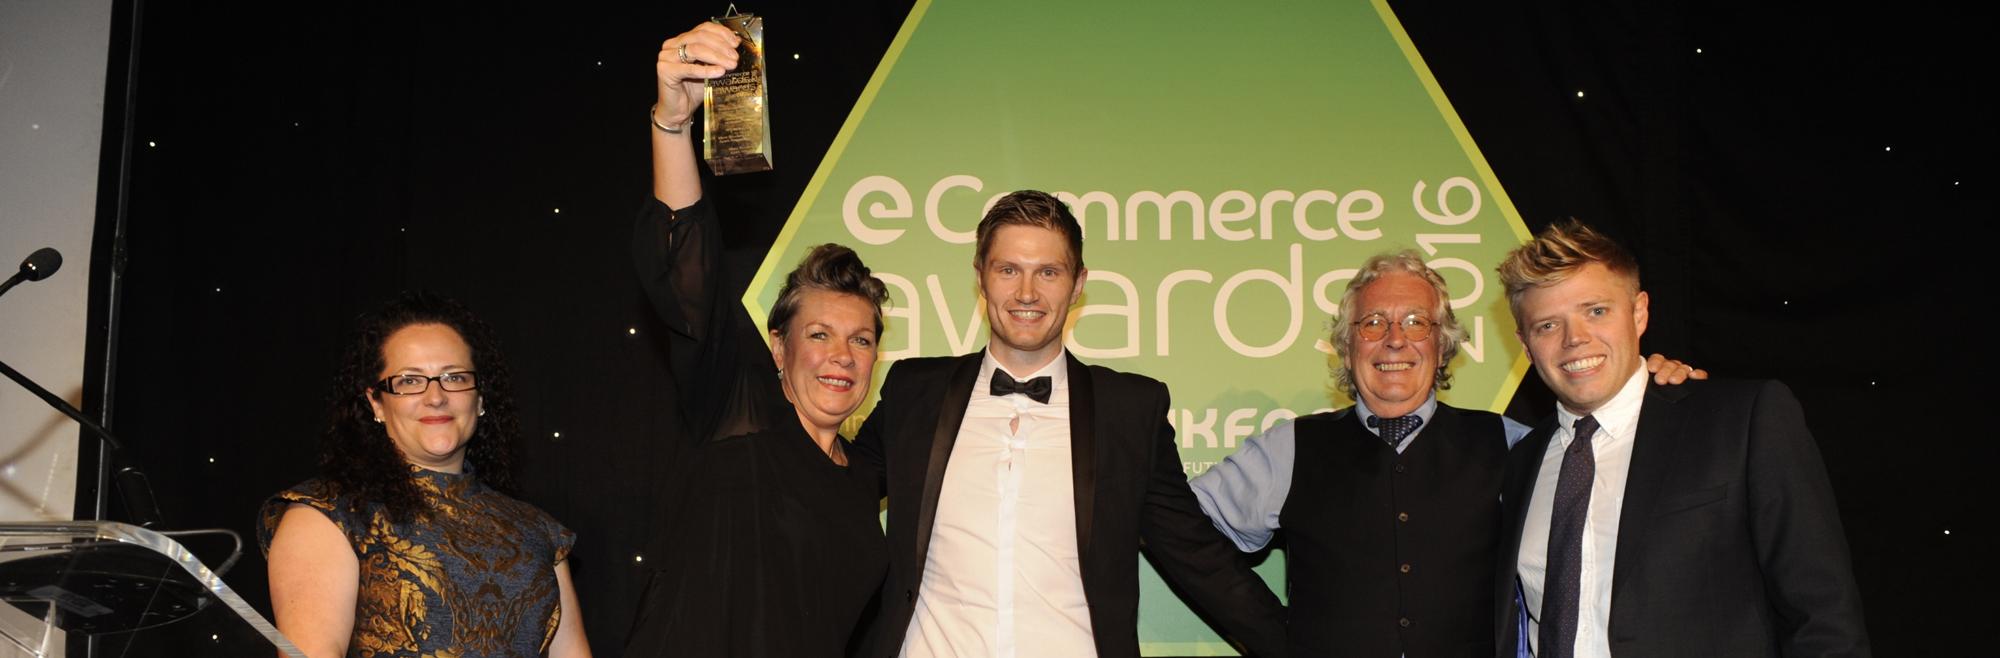 Spark response sponsor eCommerce Awards.png